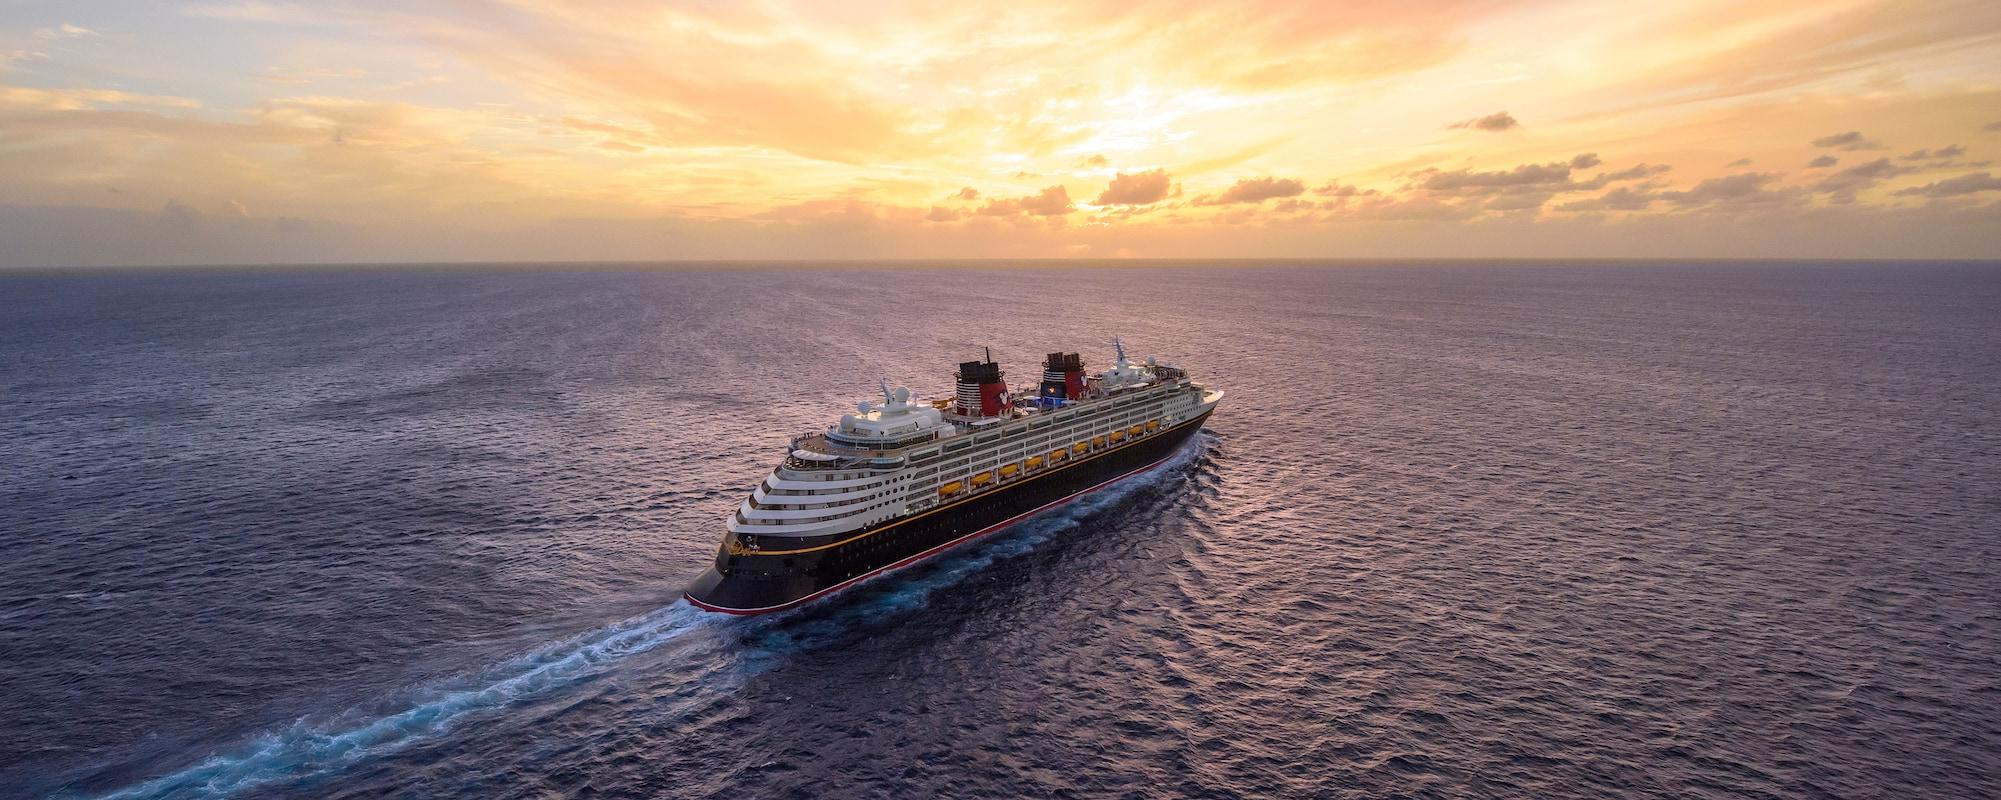 disney cruise 2019 - HD2001×800